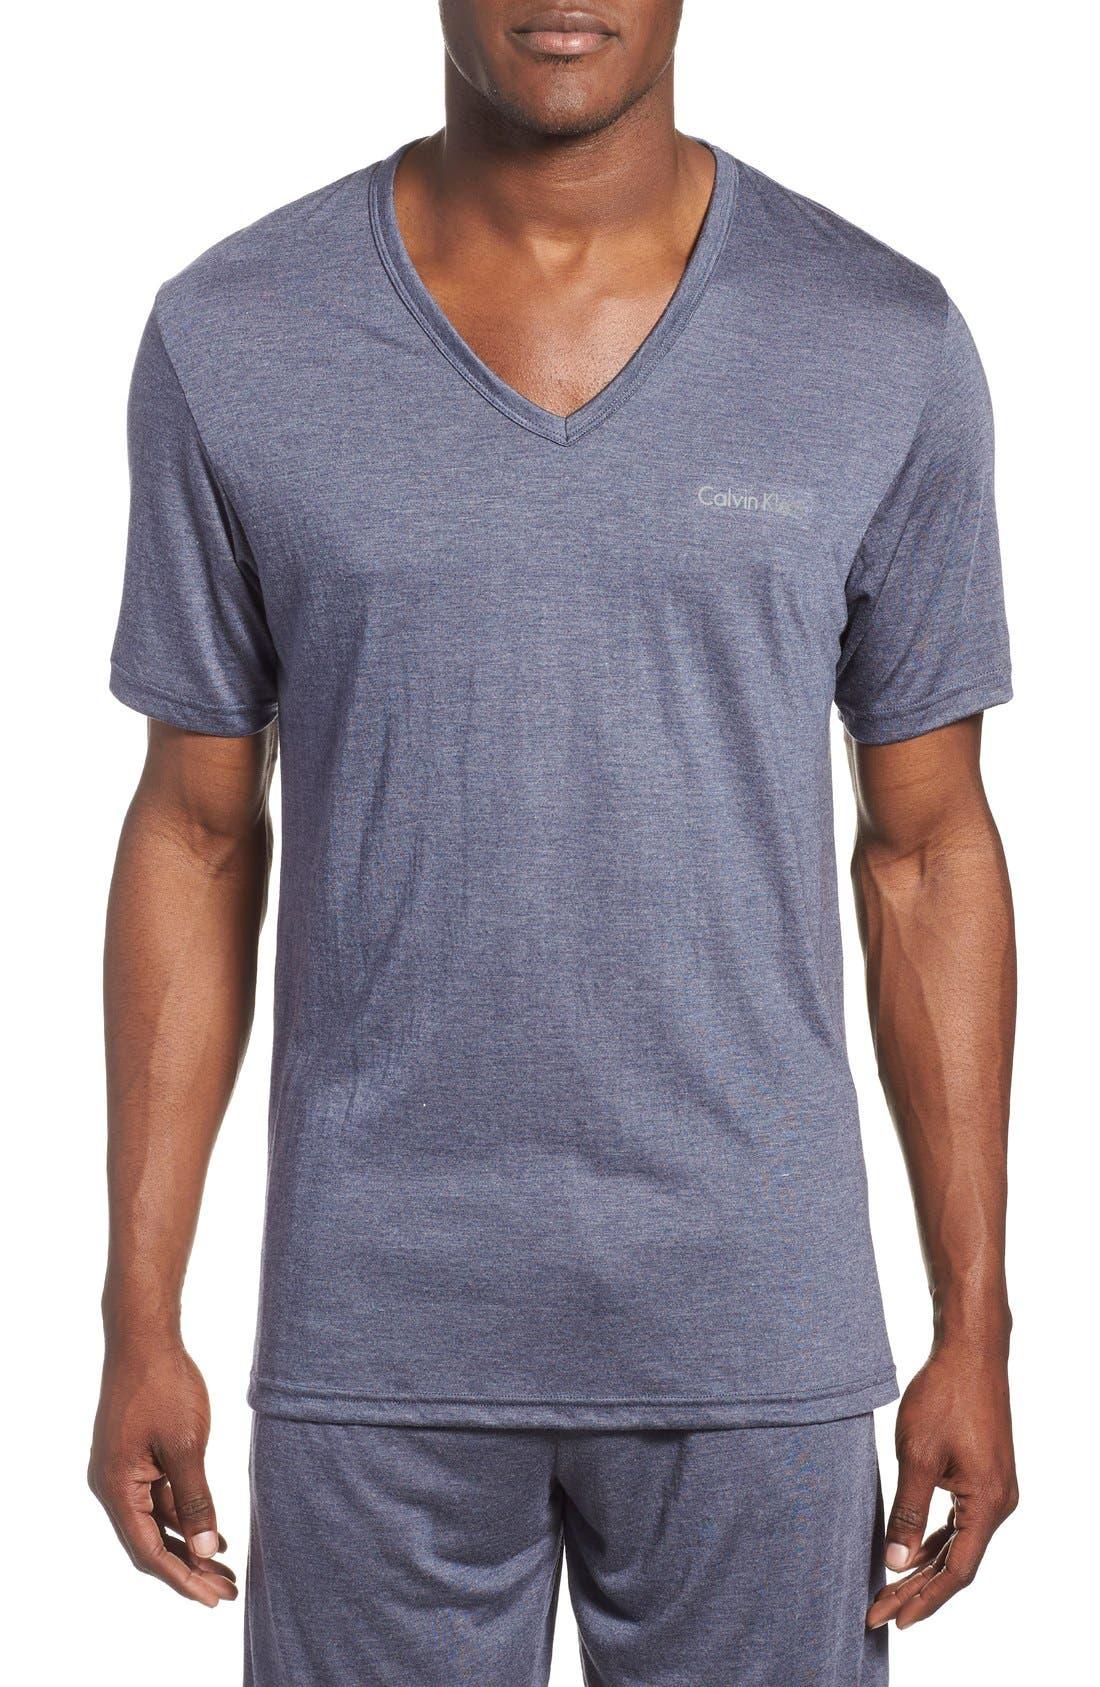 Calvin Klein 'Liquid Lounge' V-Neck T-Shirt